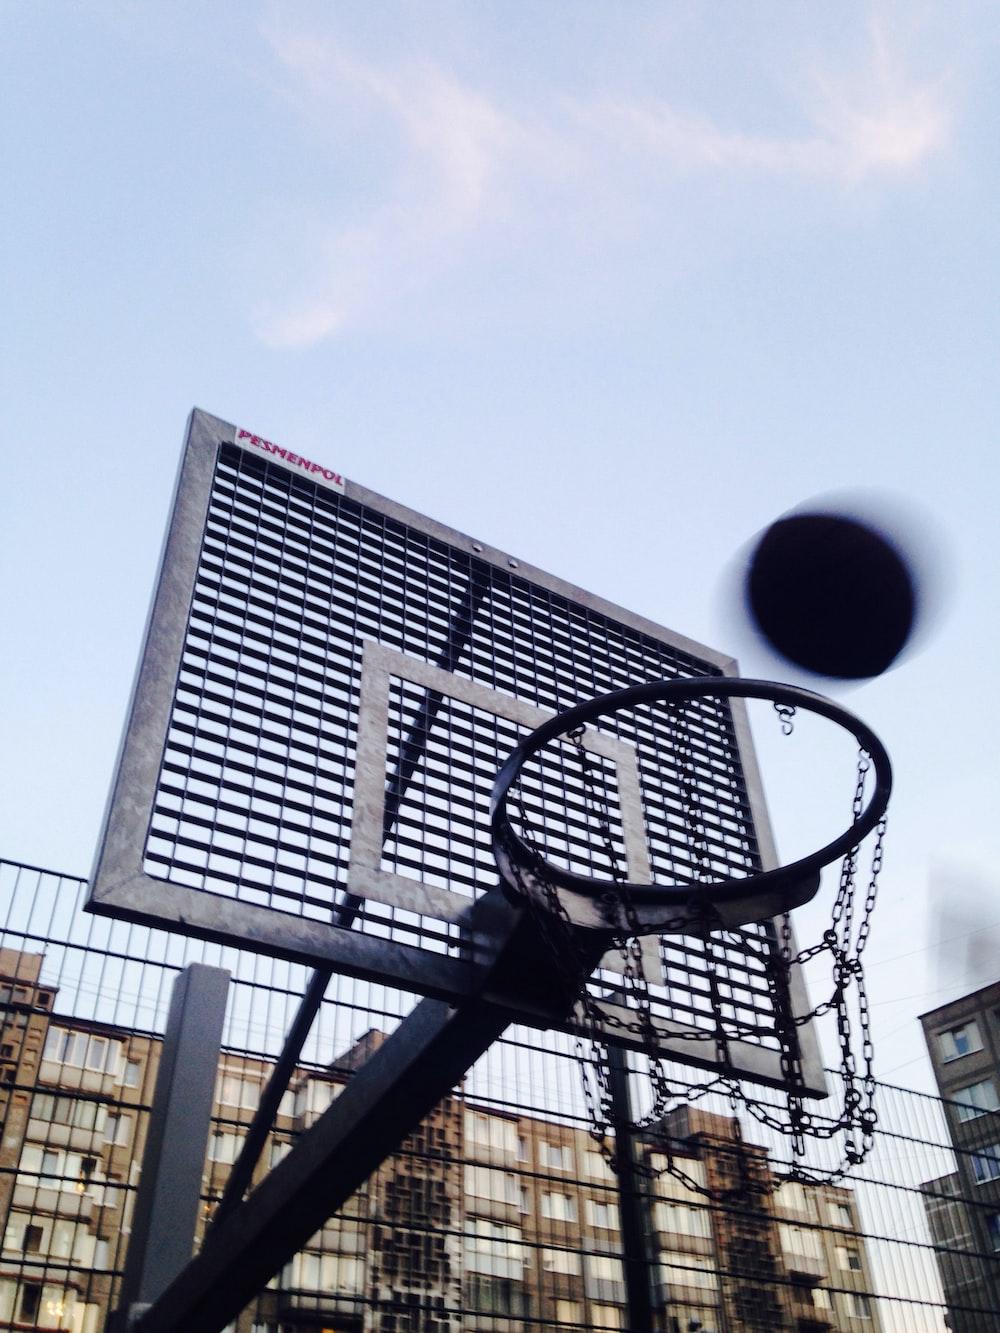 gray and black basketball hoop and backboard at daytime